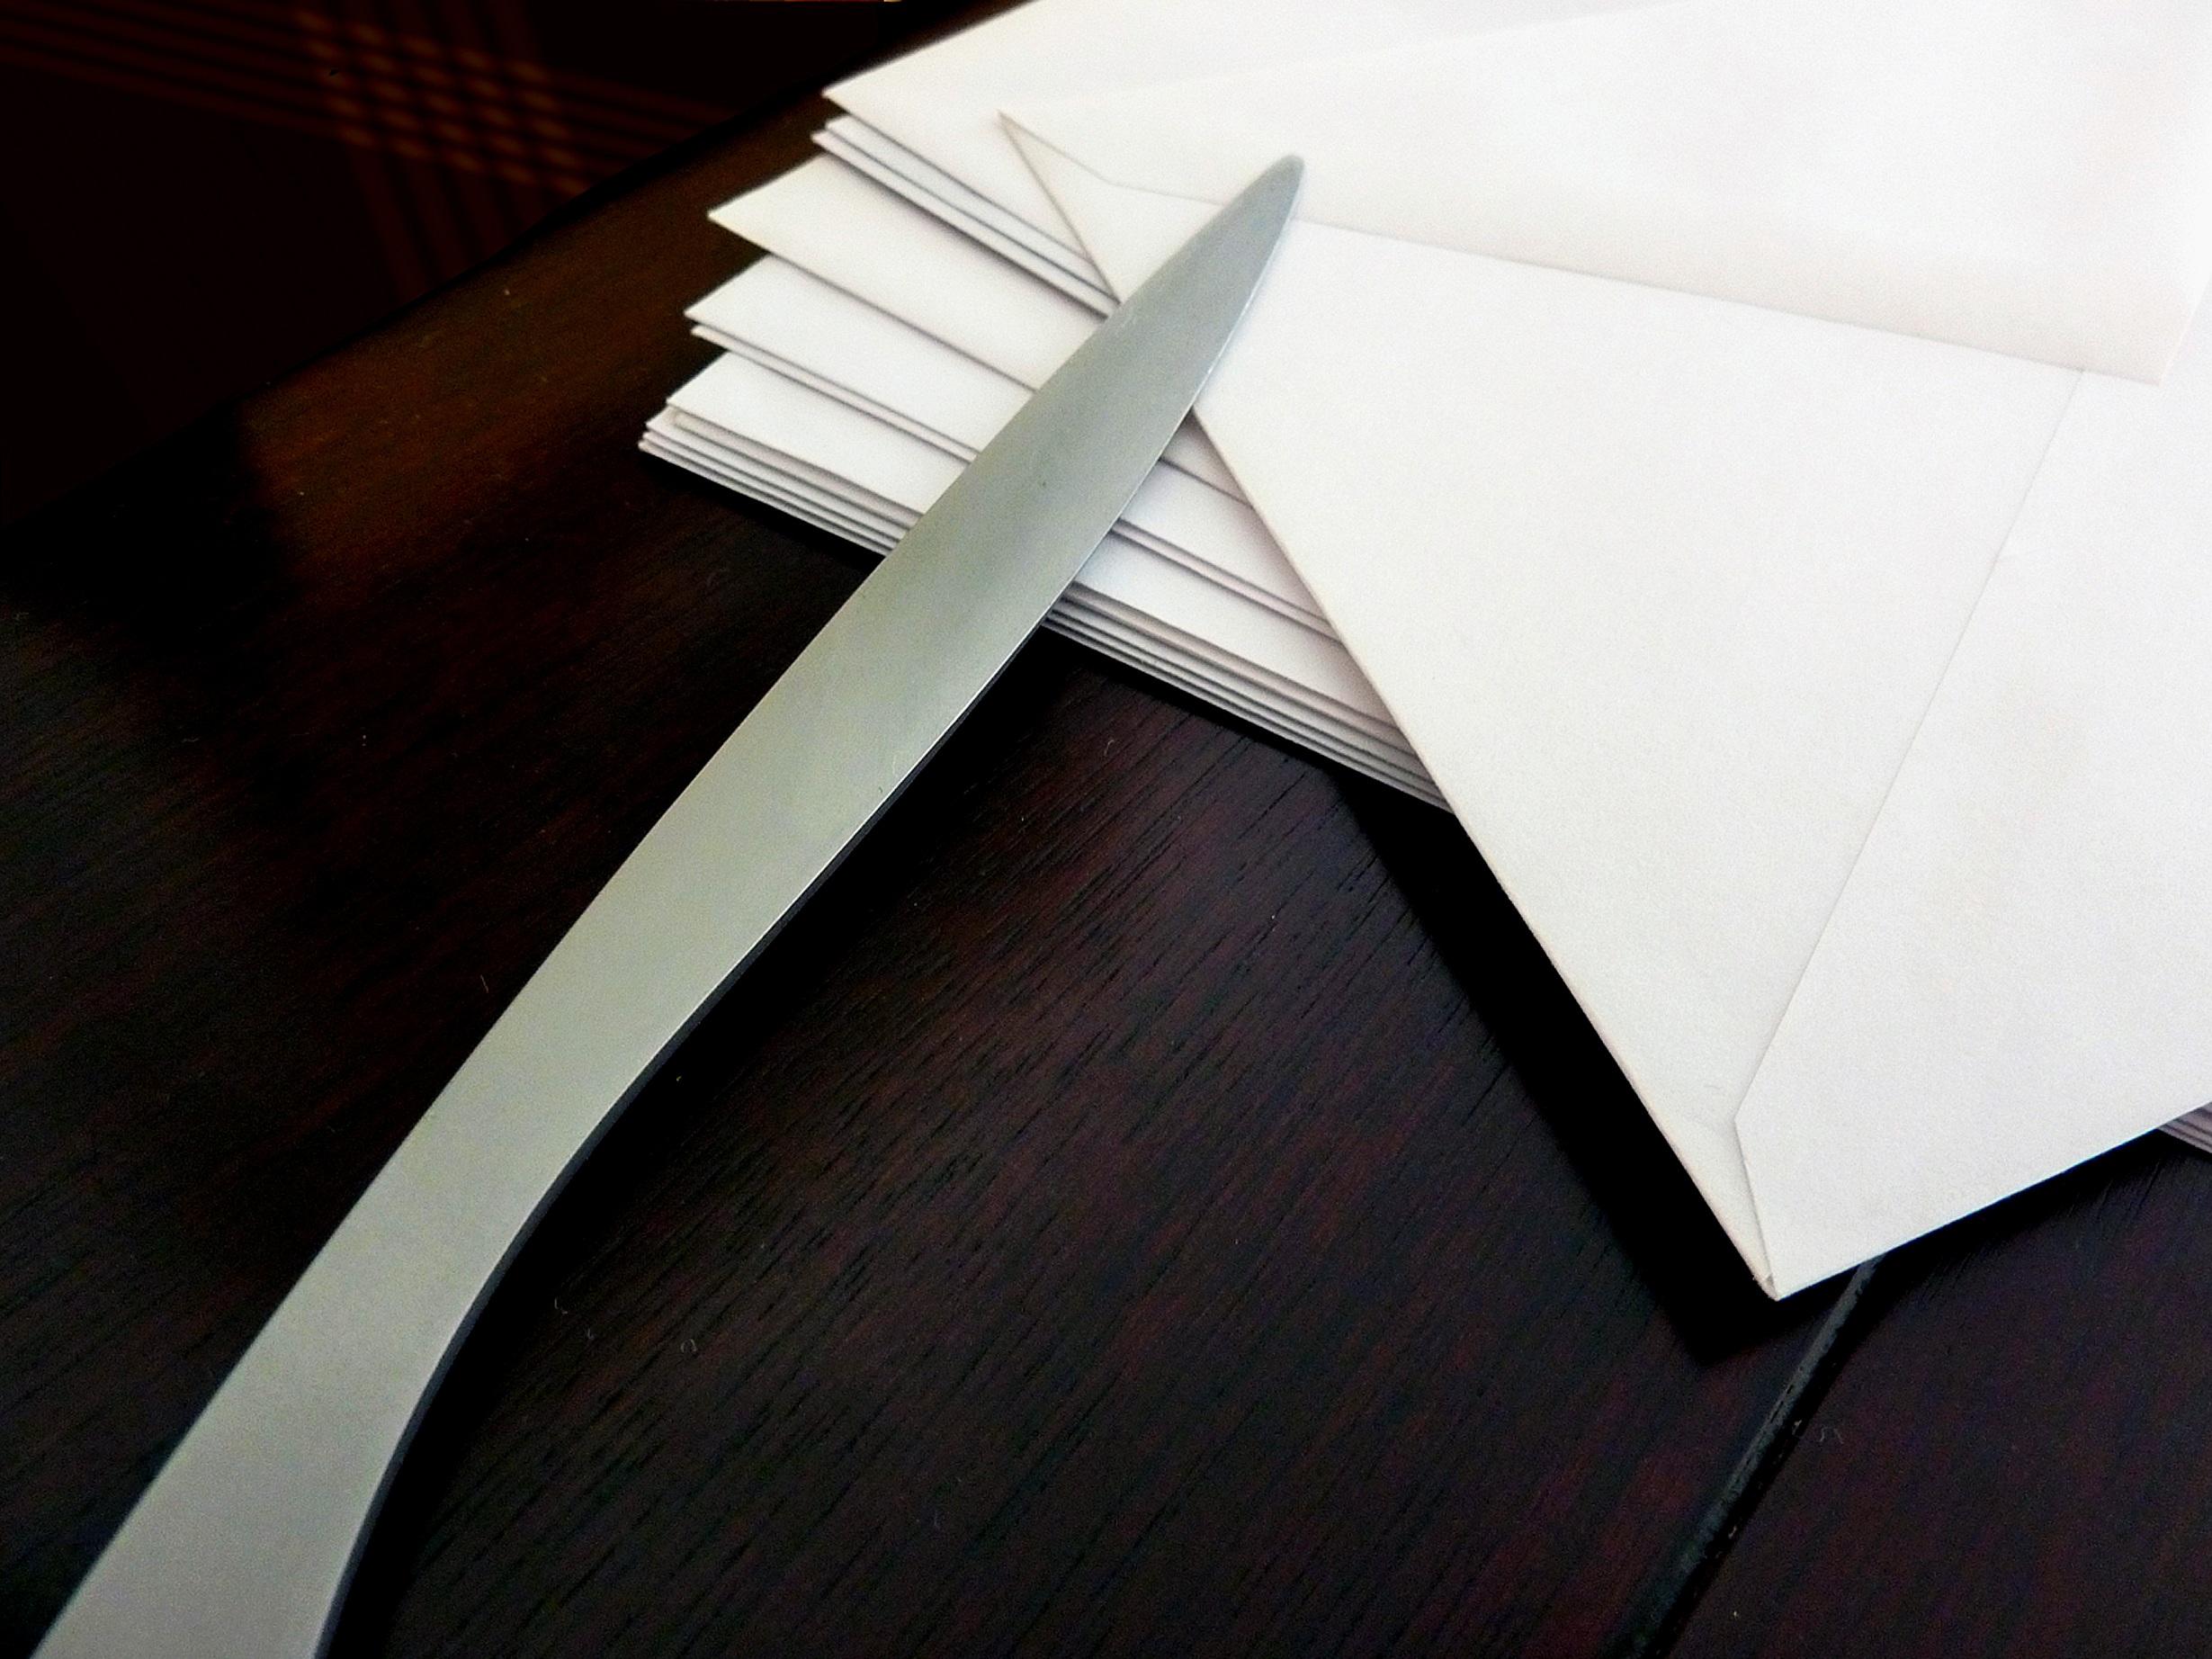 Kostenlose Foto Kreativ Flügel Post Weiß Liebe Frühling Büro